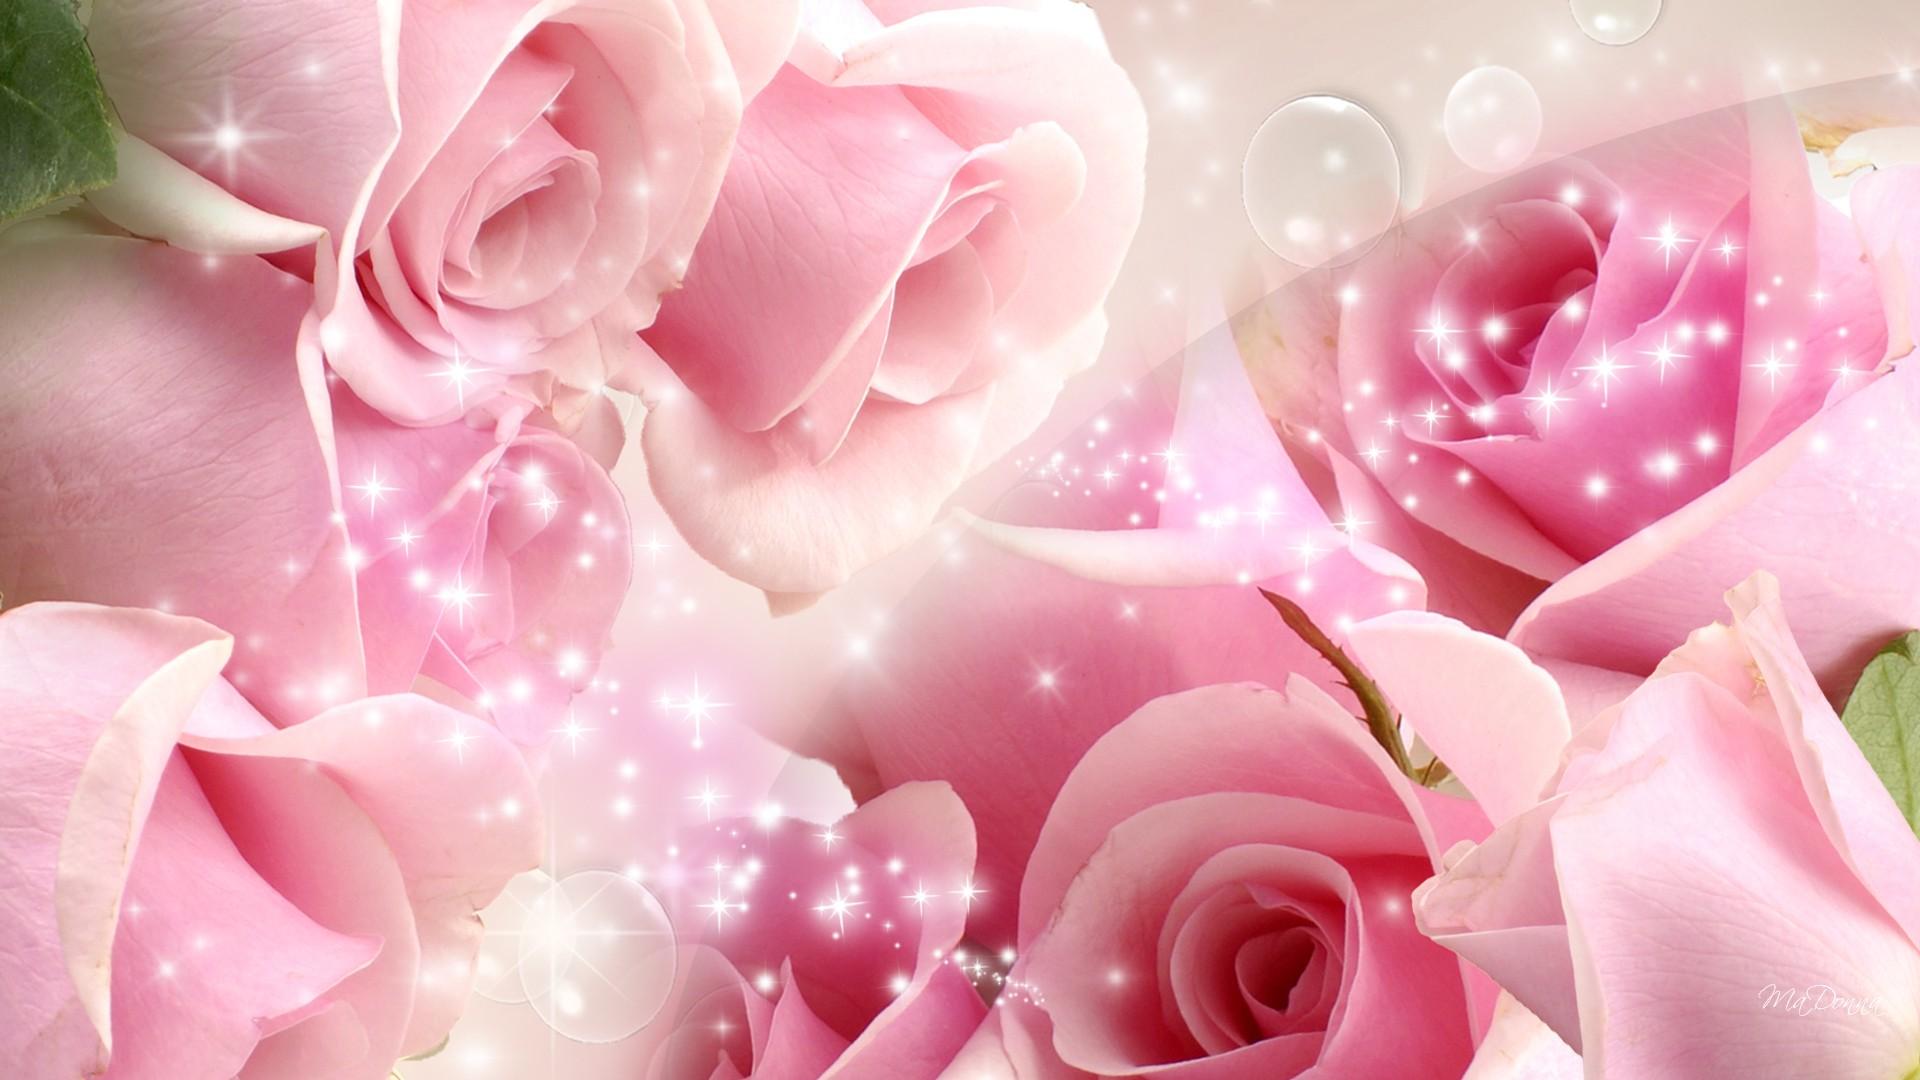 Semnificatia unui buchet de flori